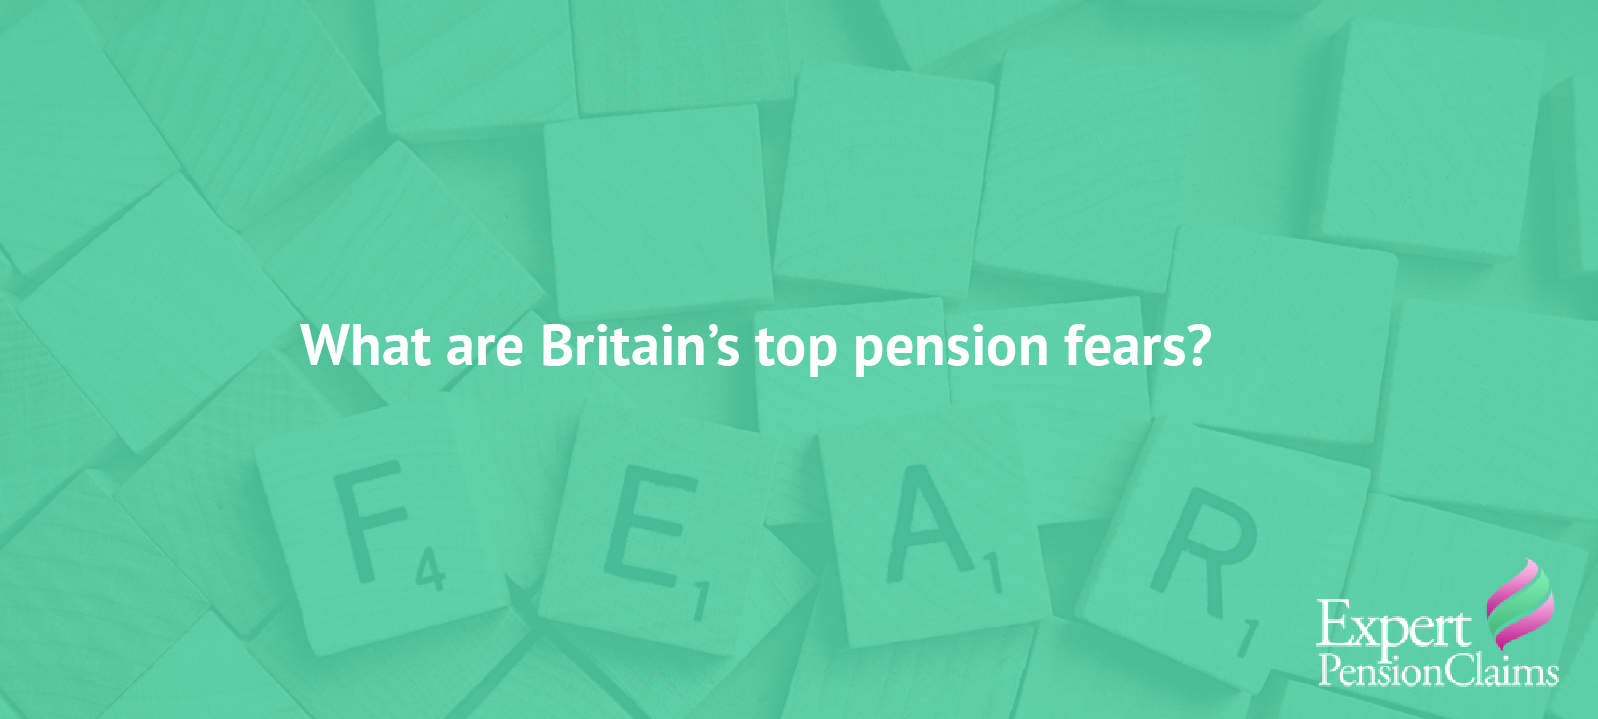 Top UK pension fears